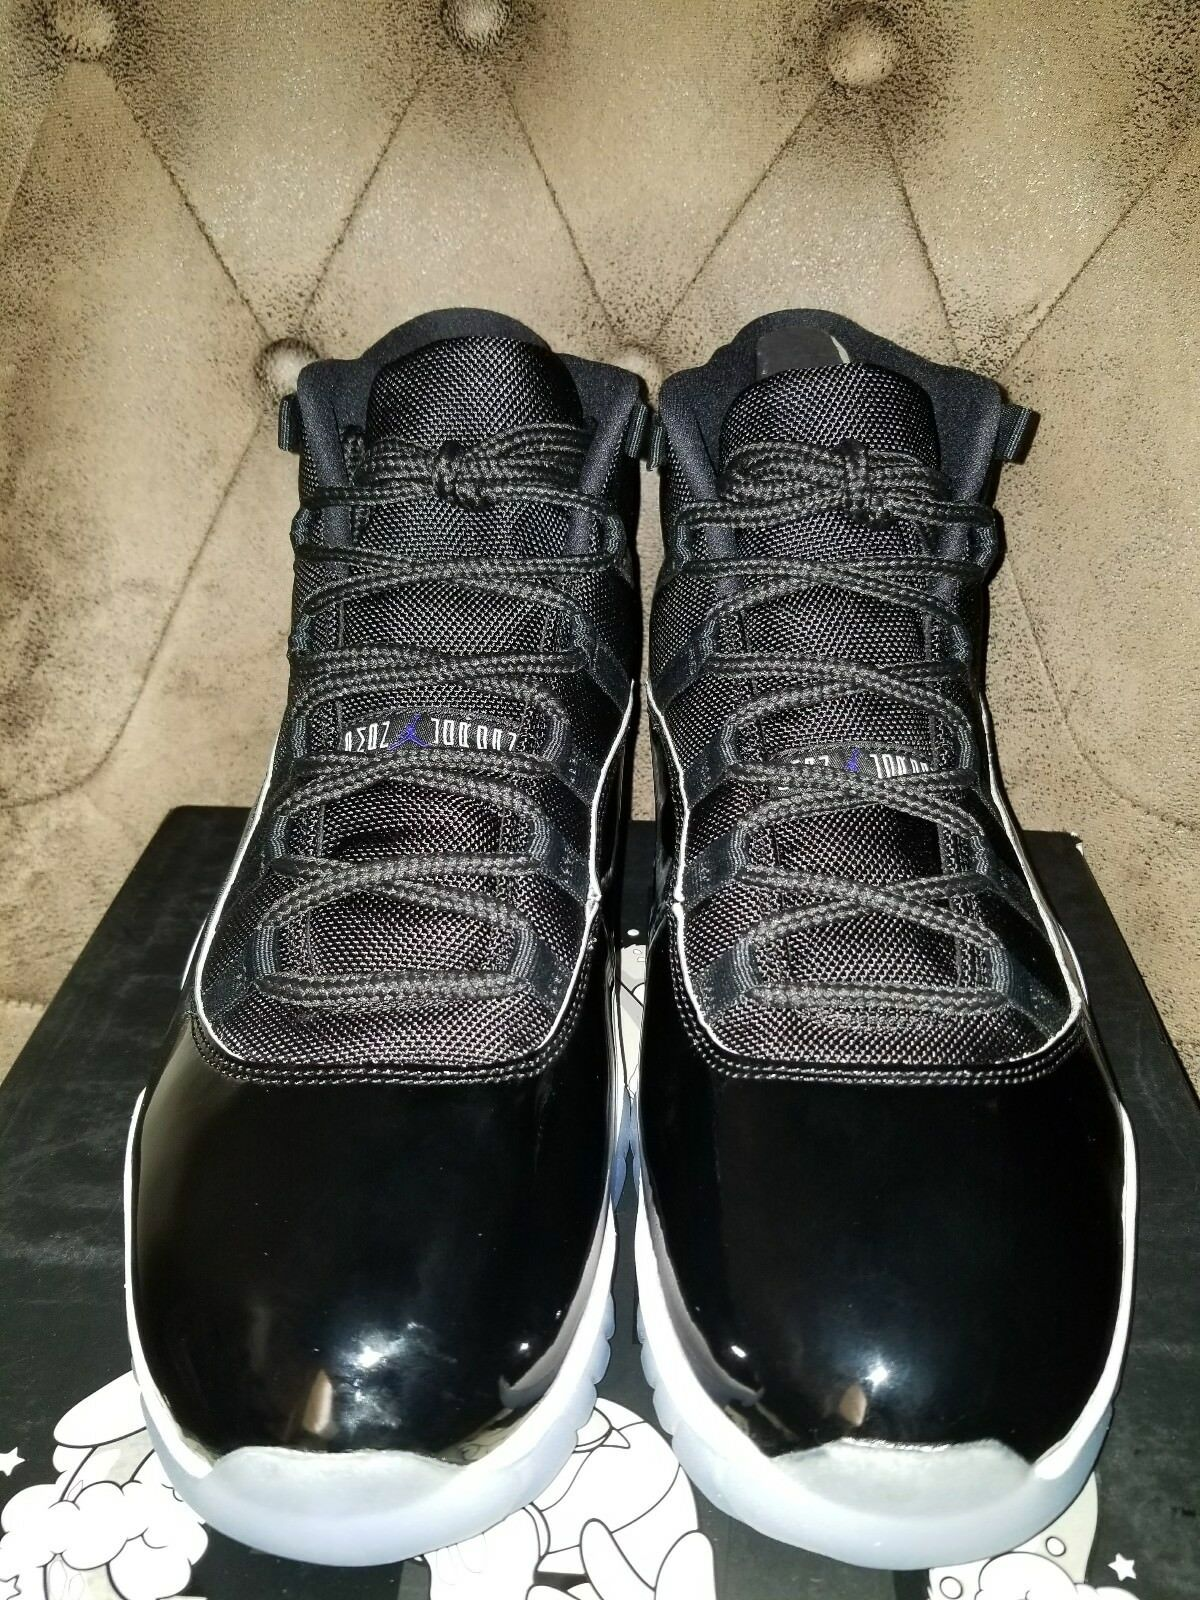 2016 Nike Air Jordan 11 Retro XI Black /Concord-White 378037 003 sz 14